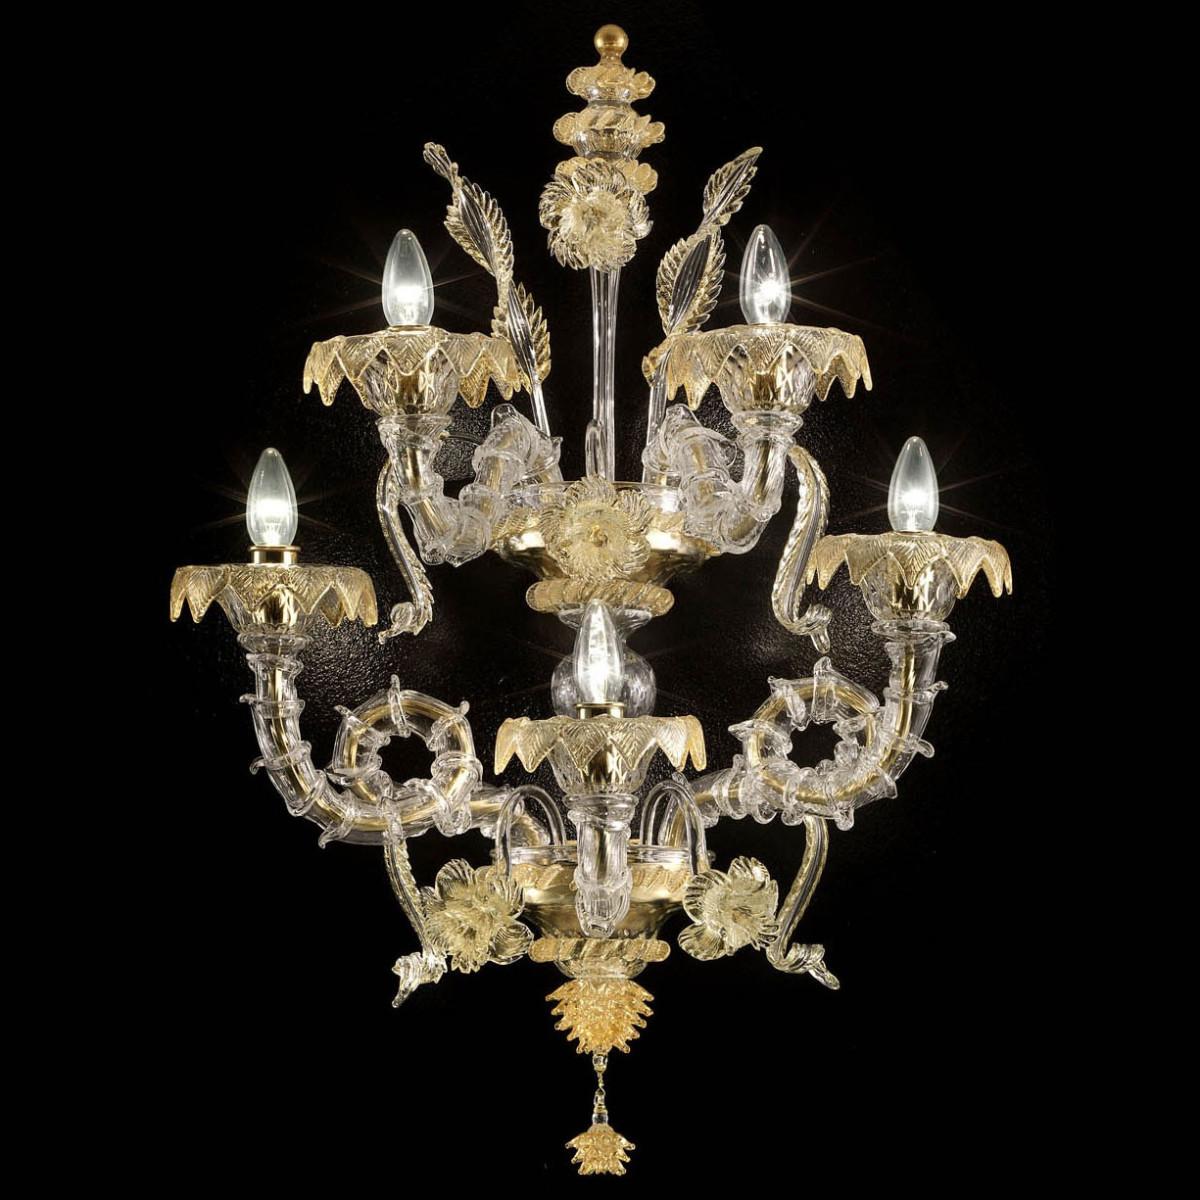 """San Zaccaria"" aplique de Murano - 5 luces - transparente y oro"